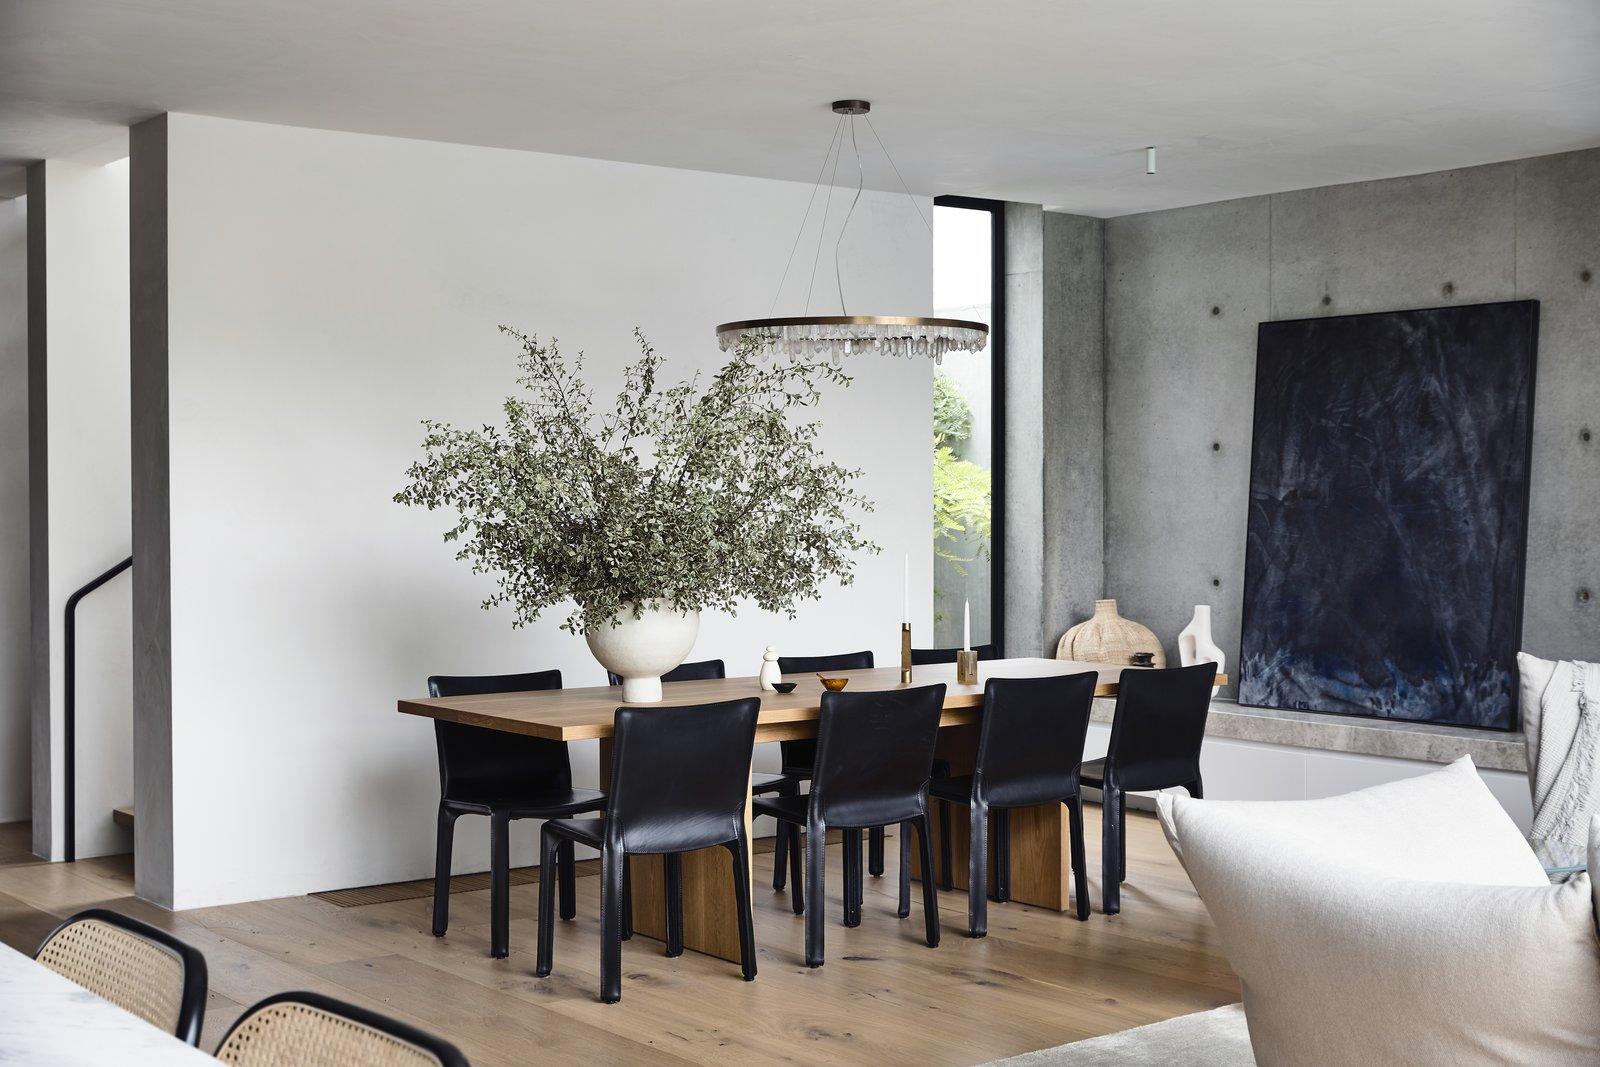 Scandizzo House Kennon+ dining